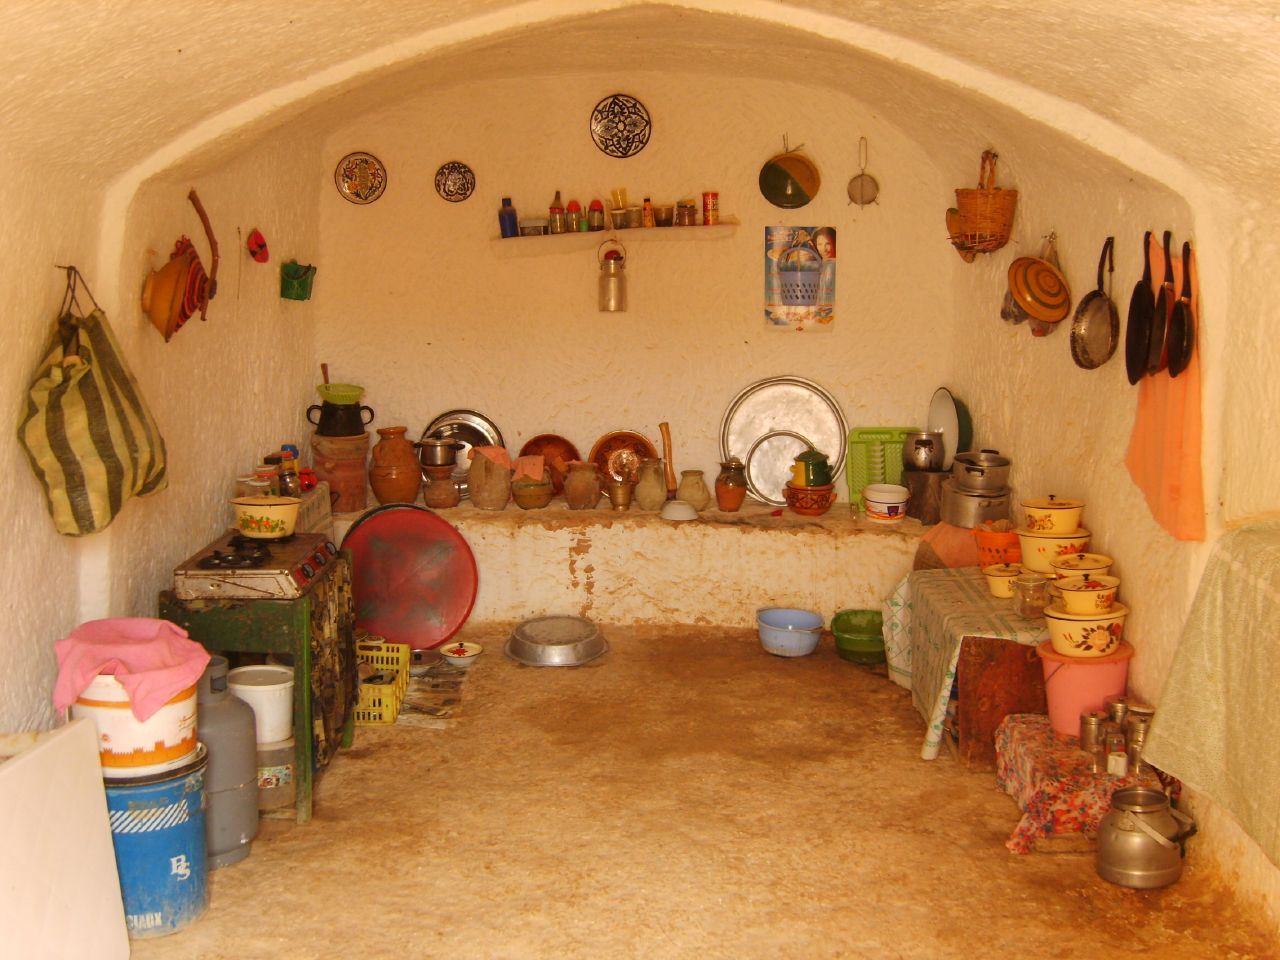 http://upload.wikimedia.org/wikipedia/commons/5/52/Matmata_Berber_kitchen.jpg